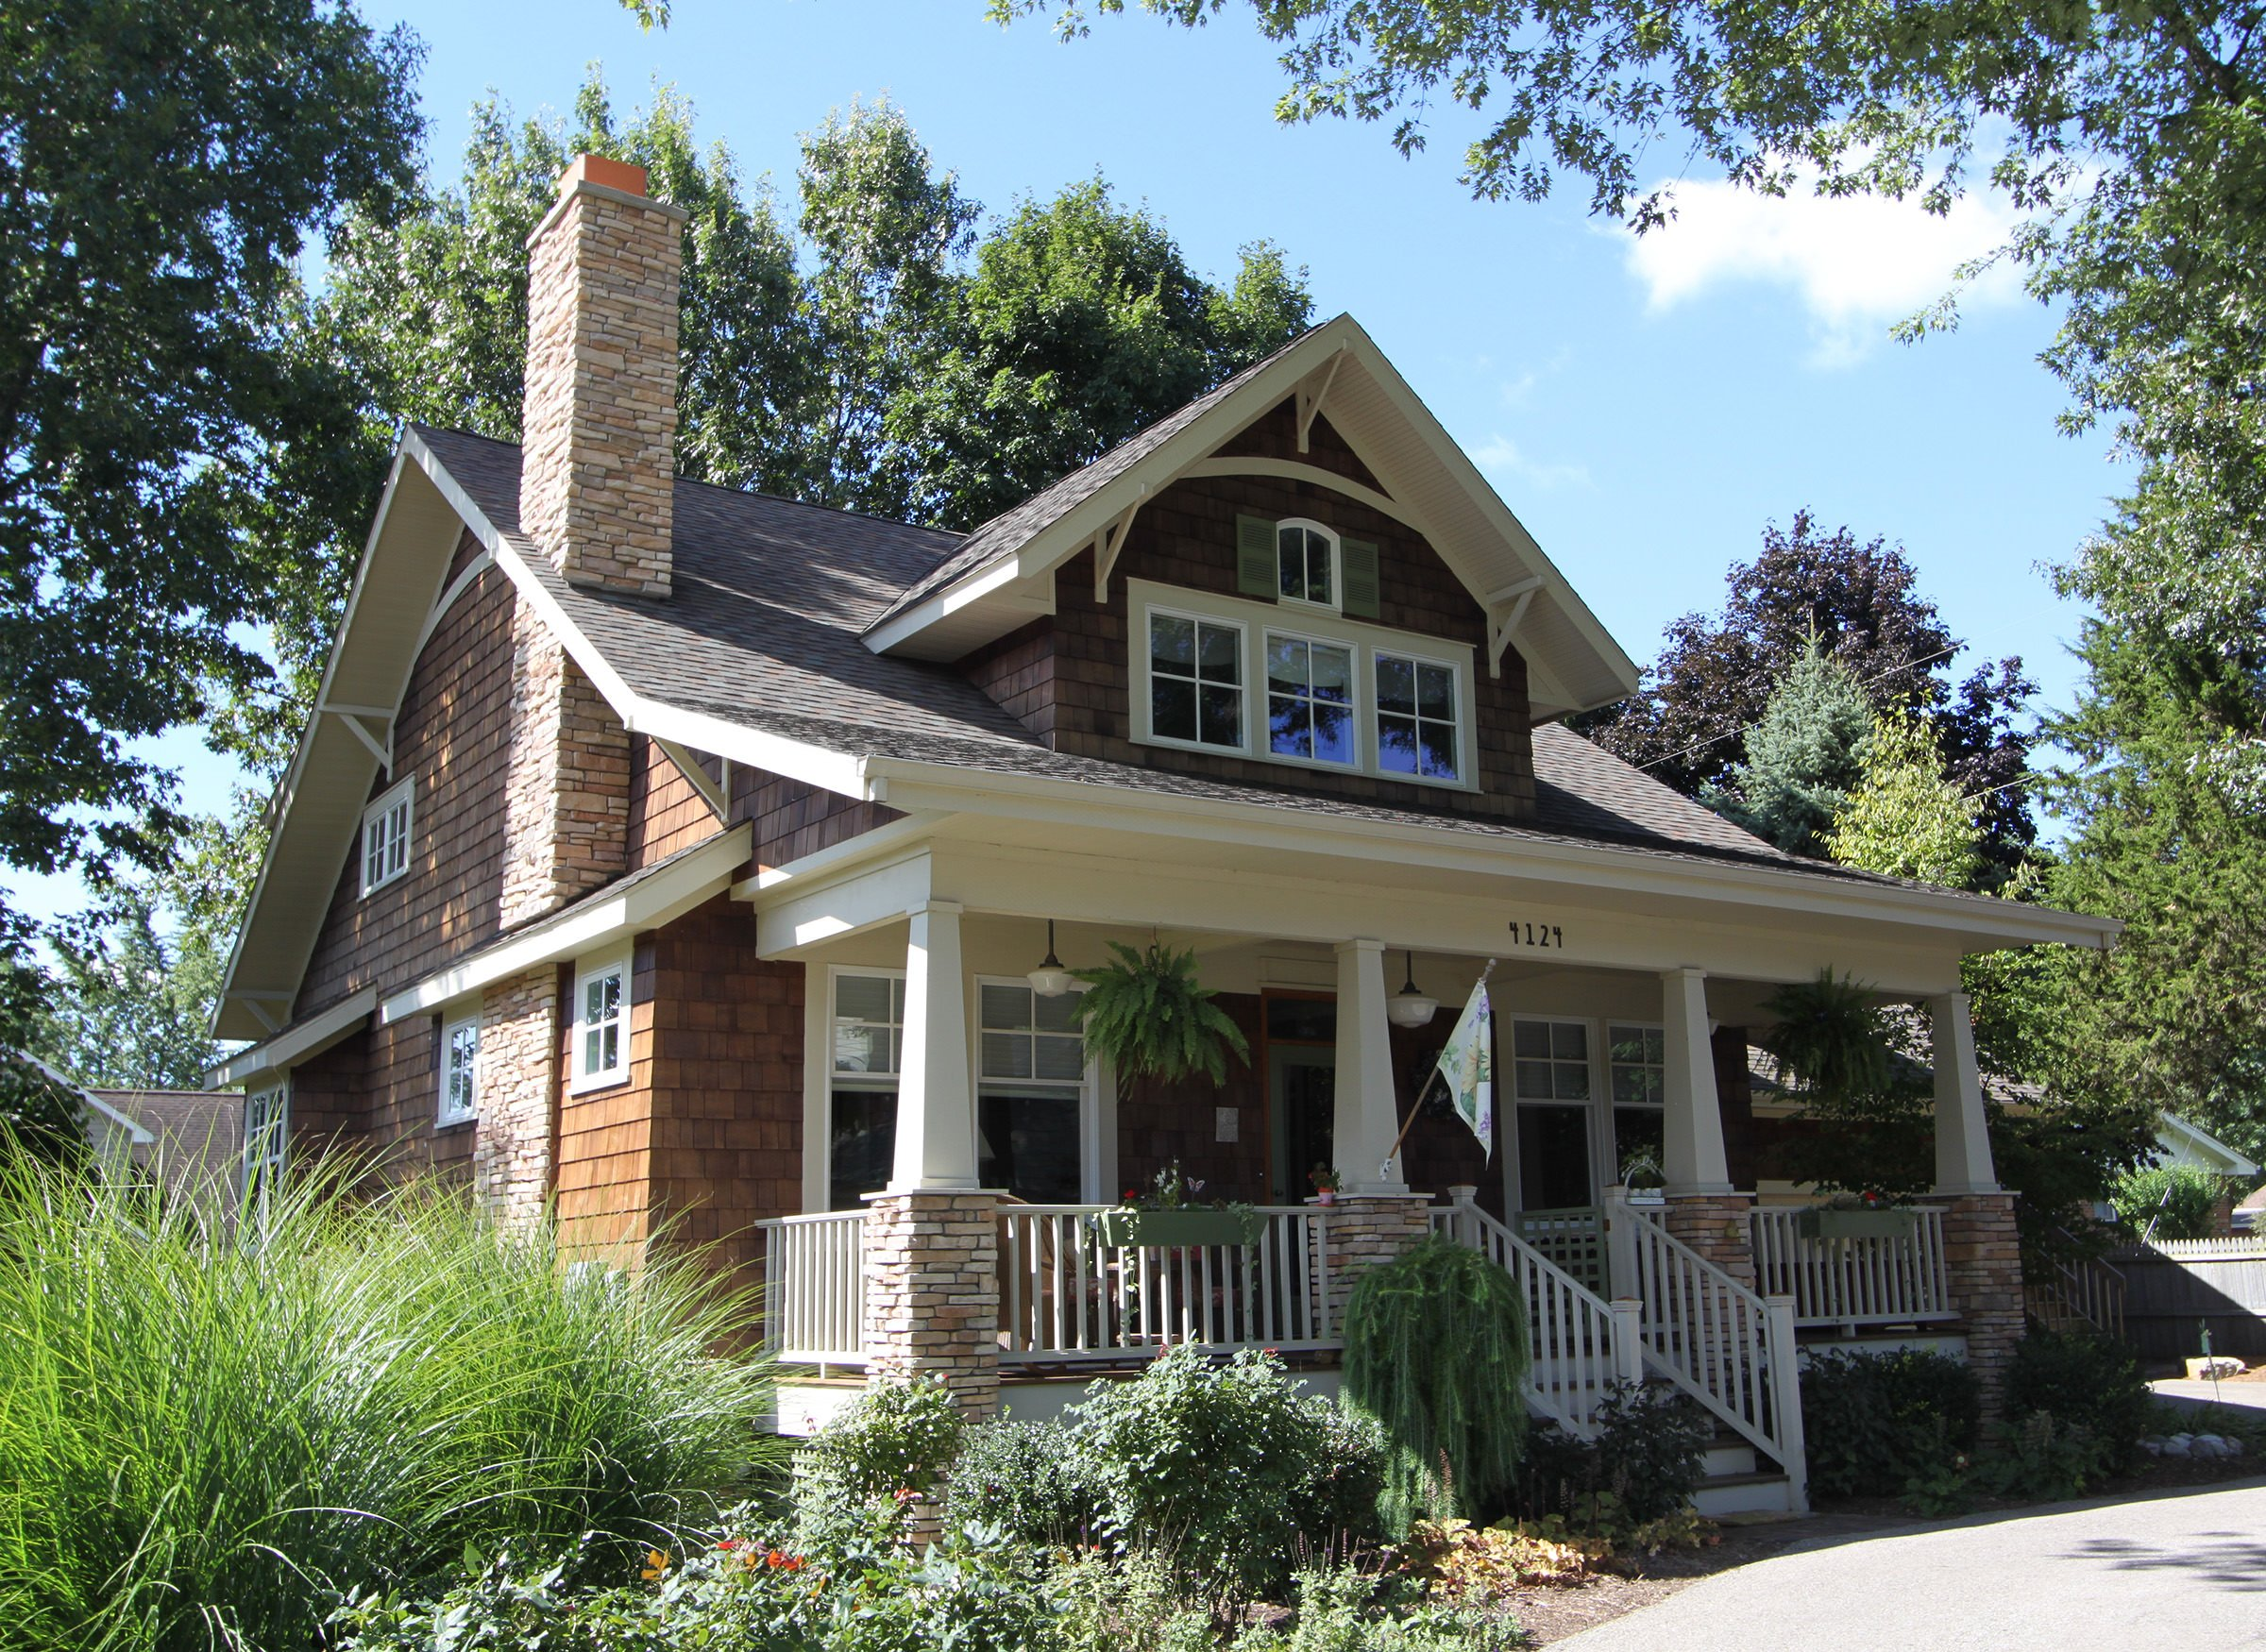 Bungalow Home Architecture